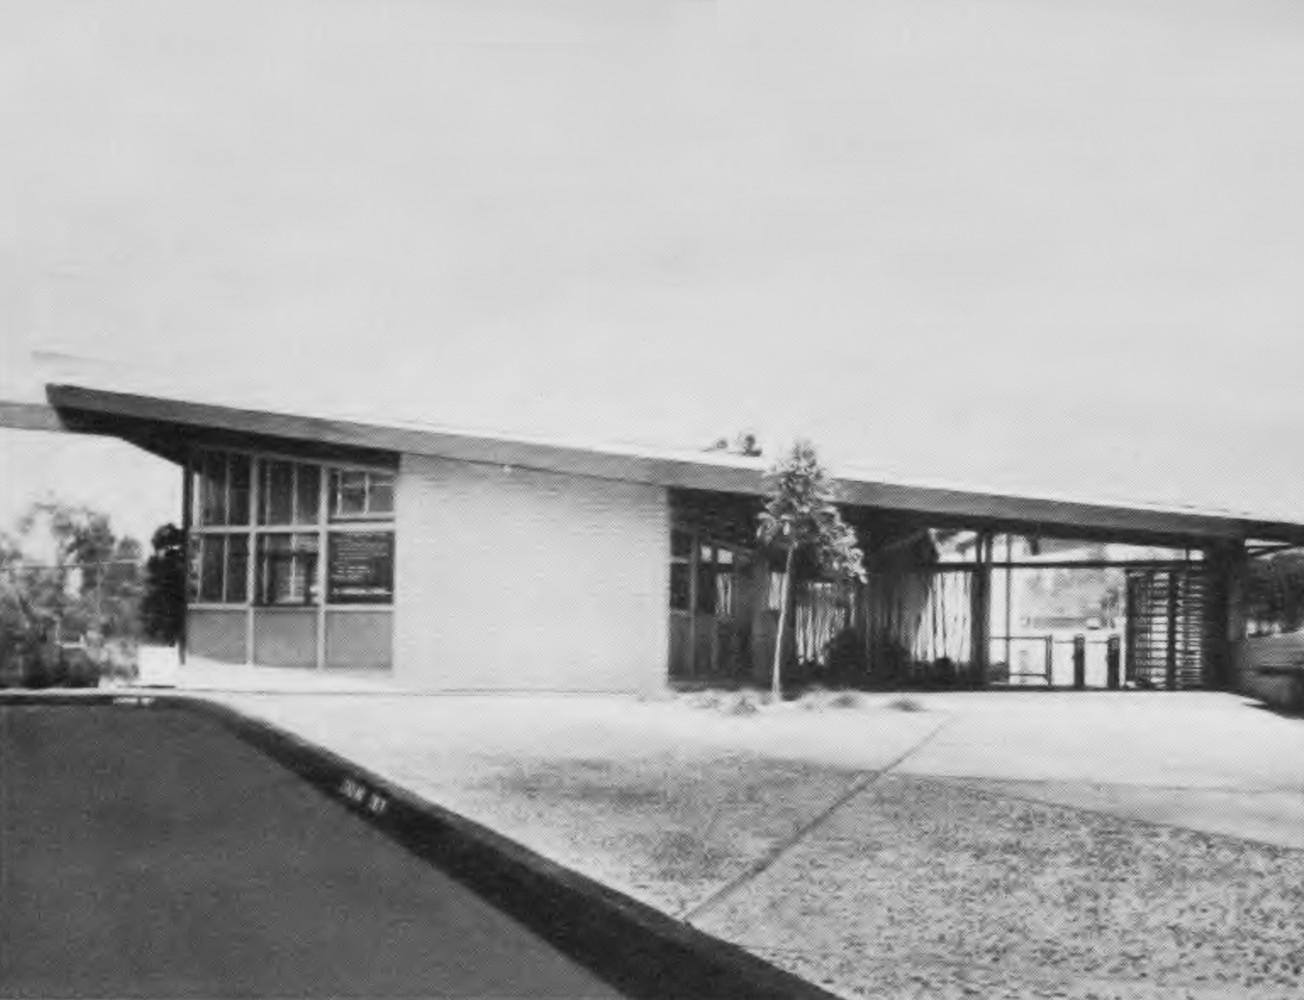 Gate House Rehabilitation - Los Angeles County Arboretum & Botanical Gardens